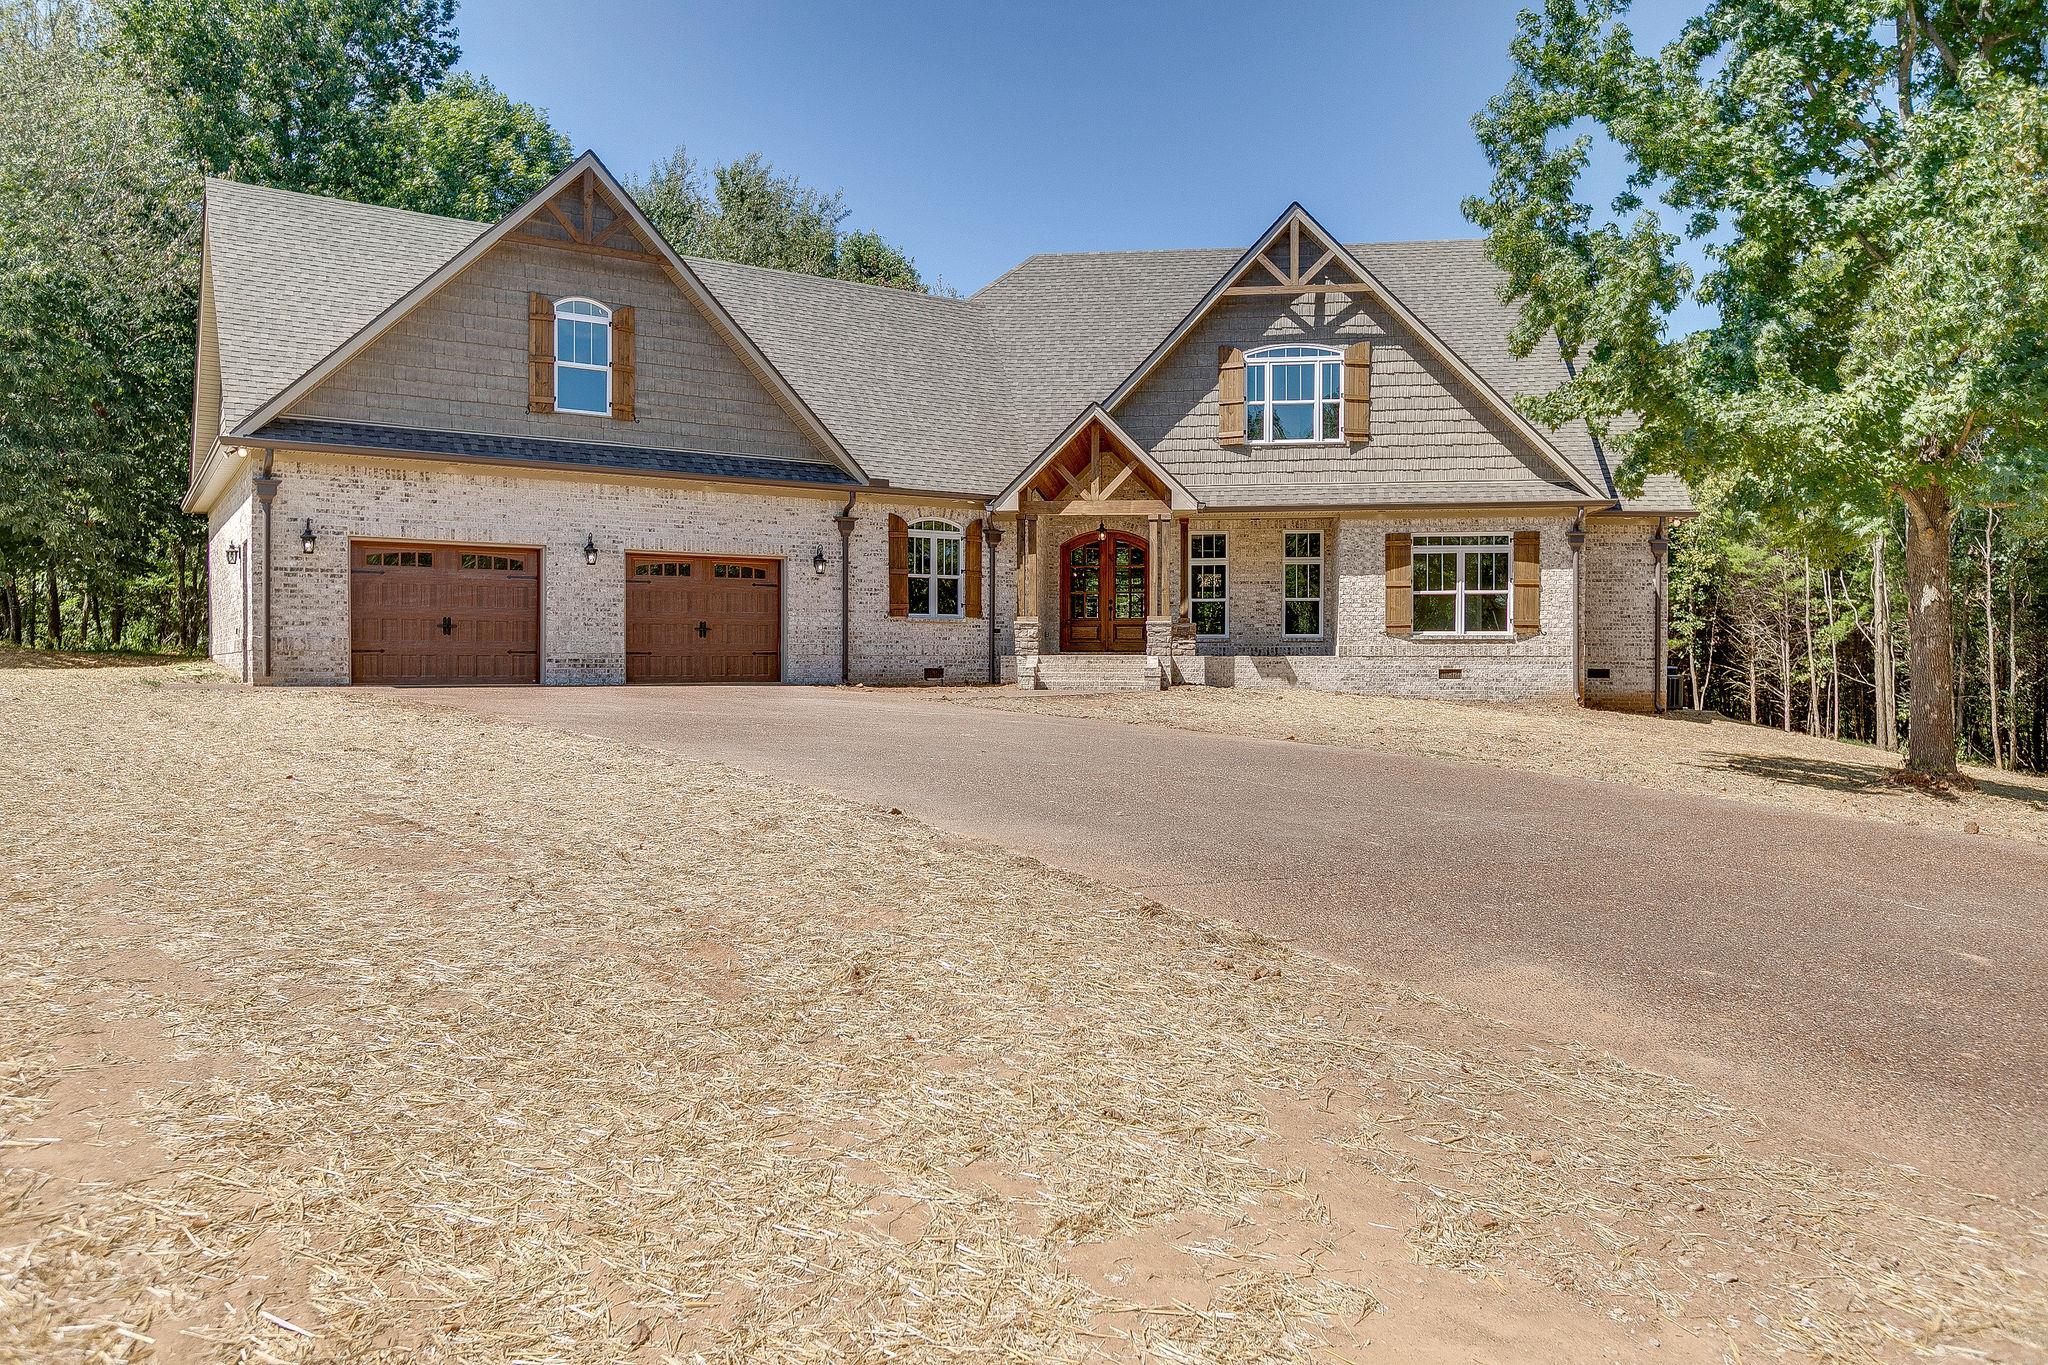 1226 Dogwood Dr, Lewisburg, TN 37091 - Lewisburg, TN real estate listing